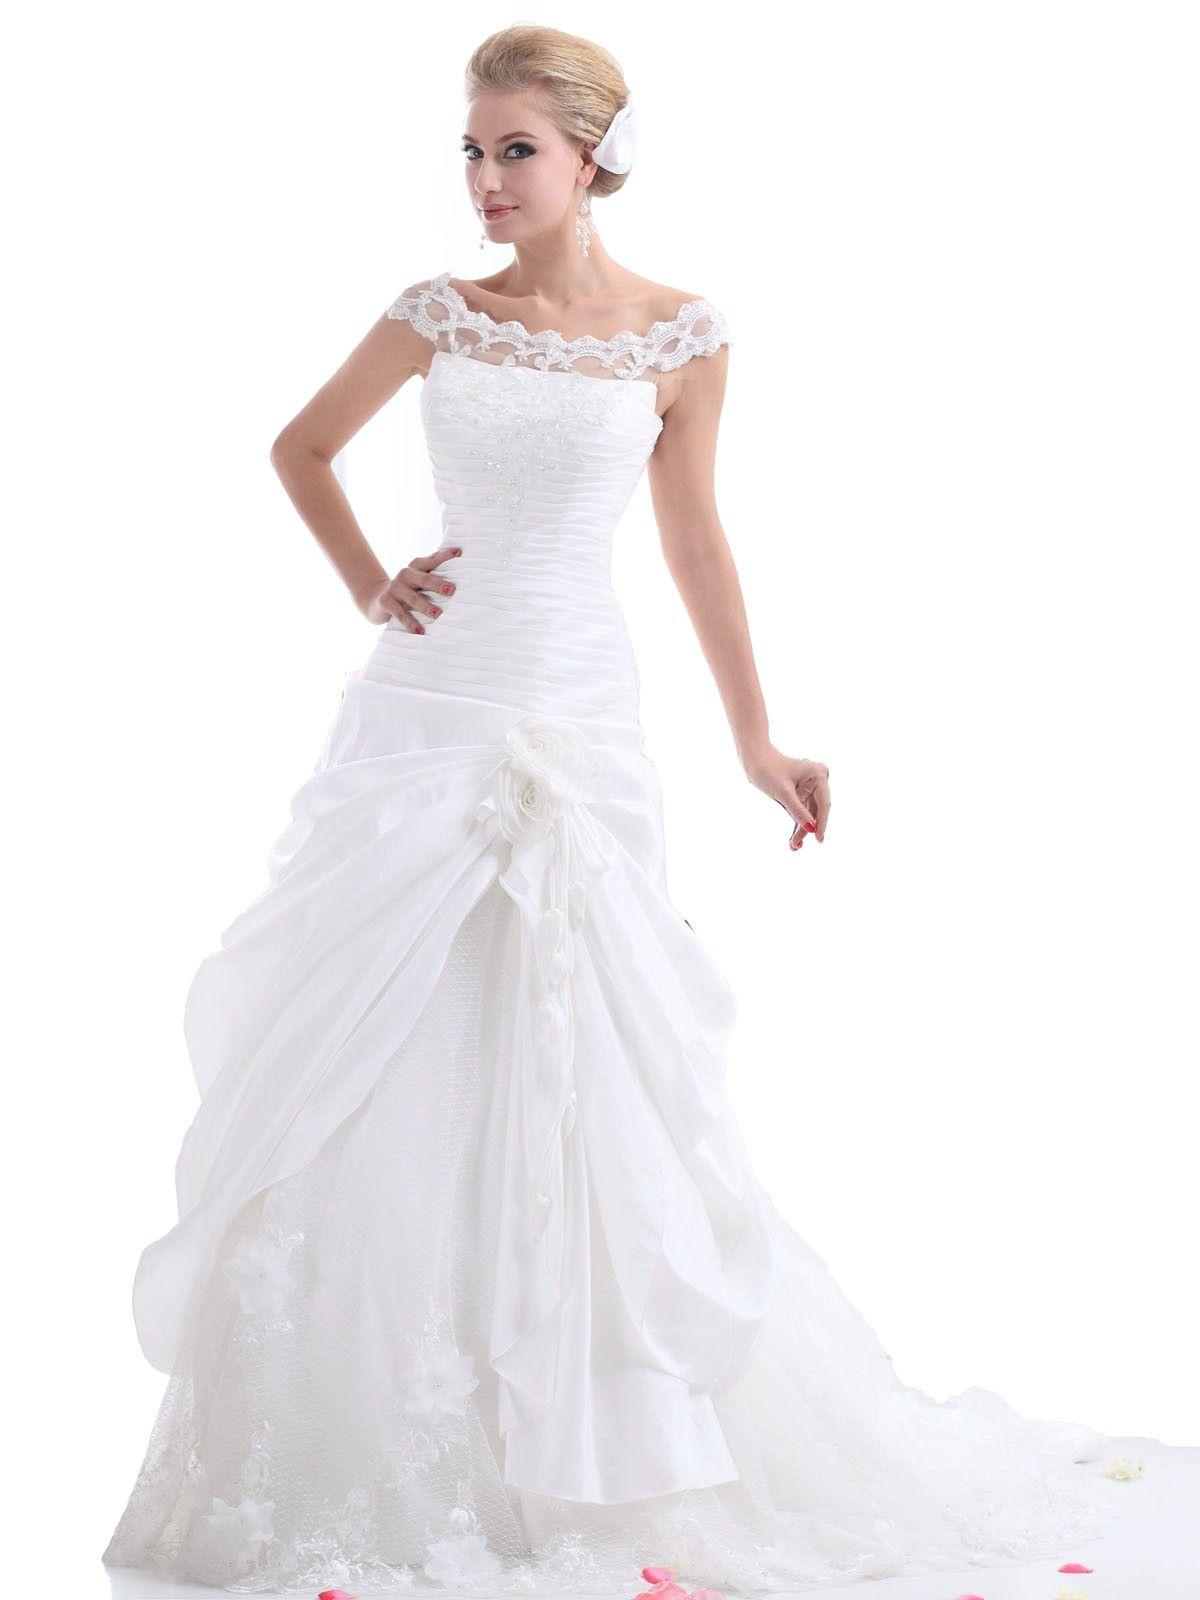 Chic u modern aline chapel train taffeta wedding dress wd